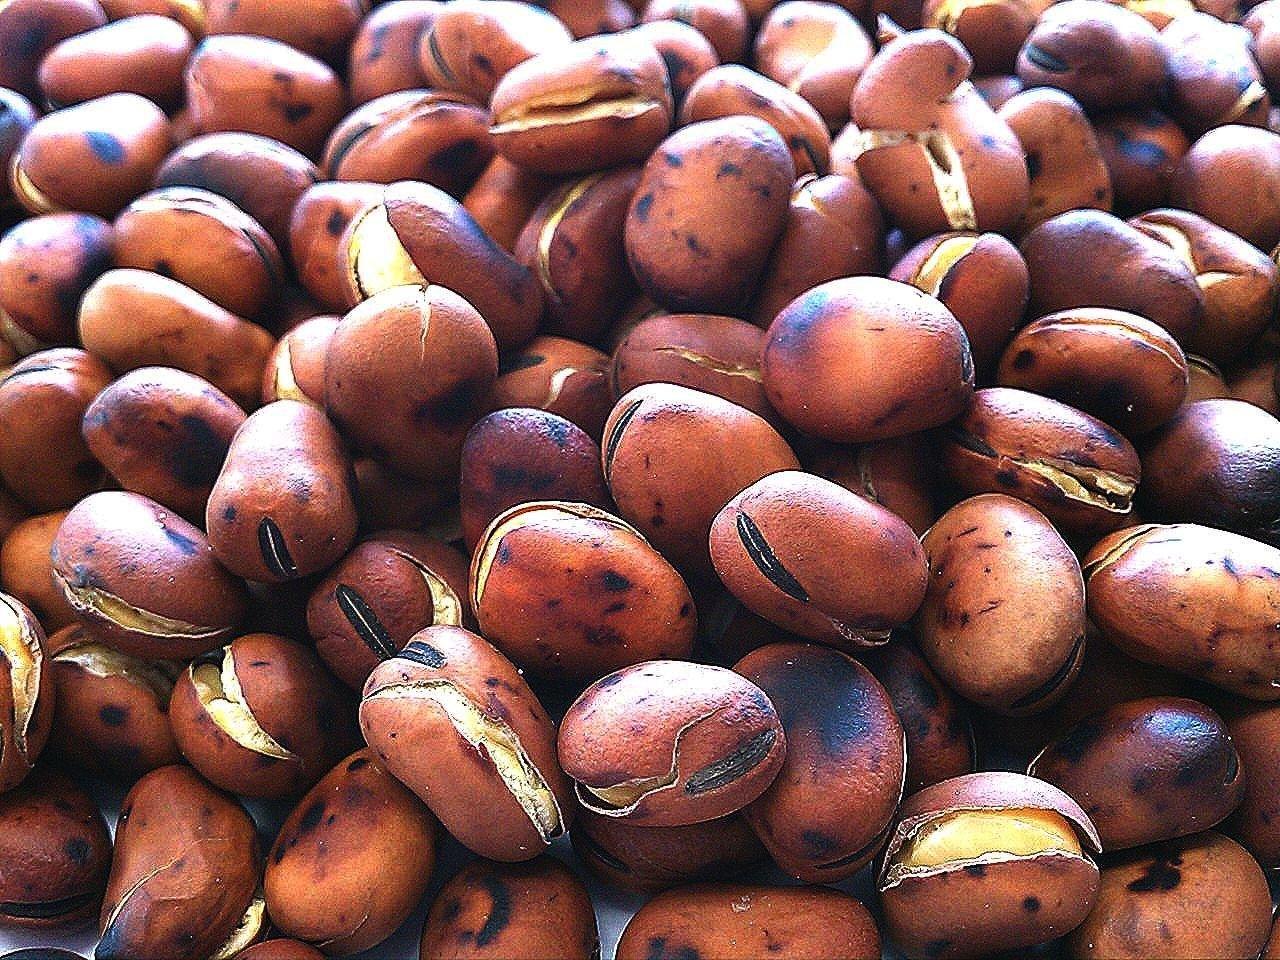 Kuroda-ya repelling beans 1000g wholesale Kyushu Ranking TOP5 factory manufactured good